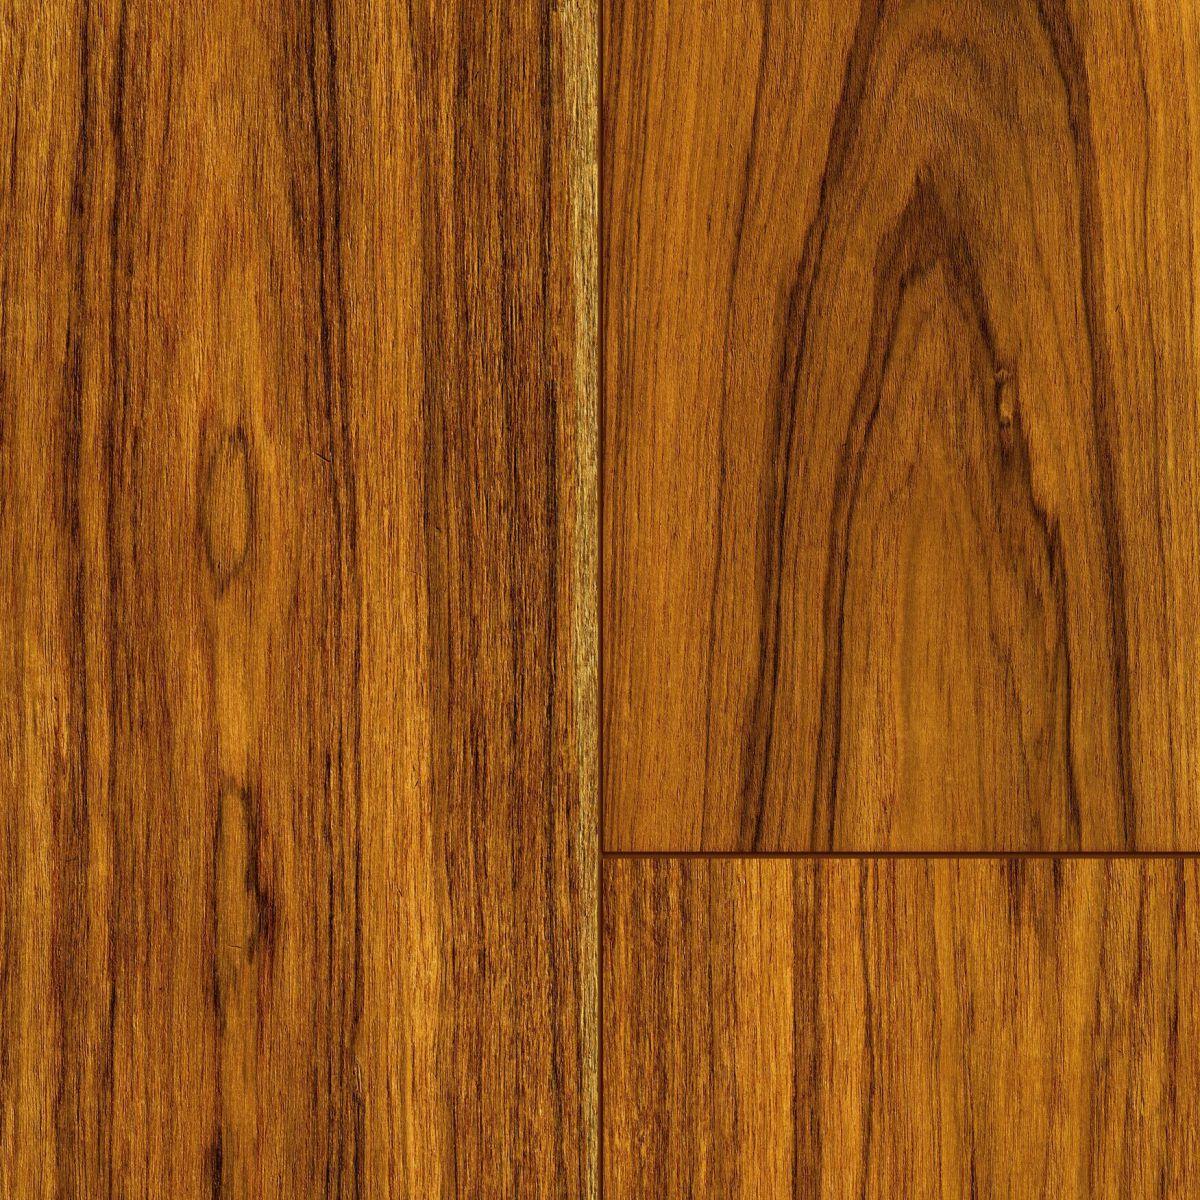 Avatara vloerdelen hout N06 detail